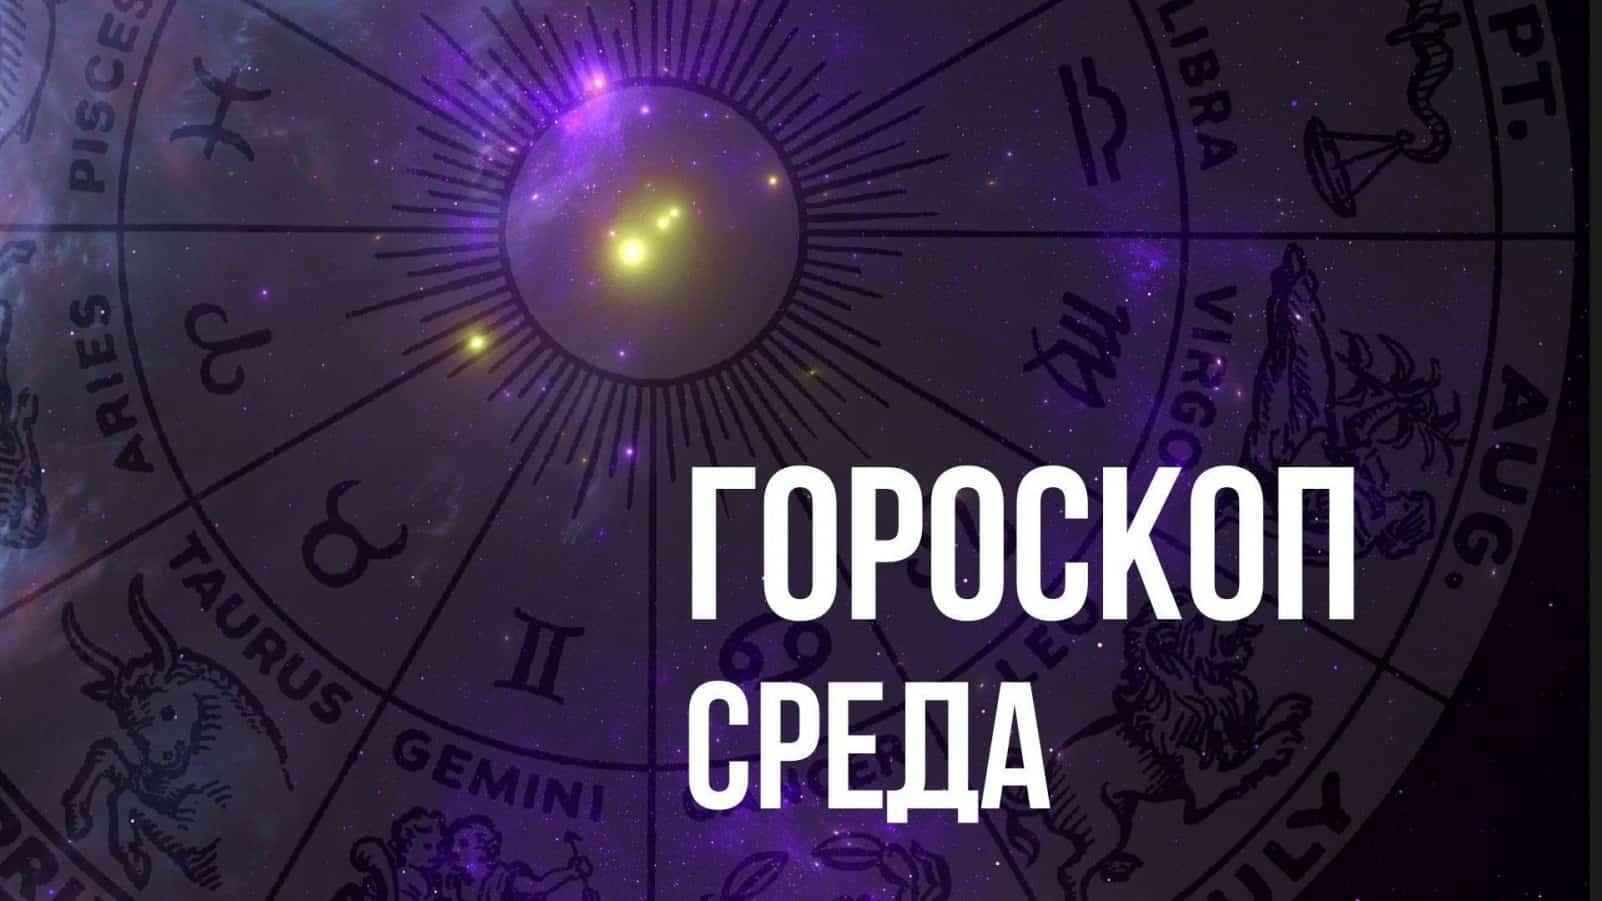 Гороскоп на среду 28 апреля для каждого знака Зодиака